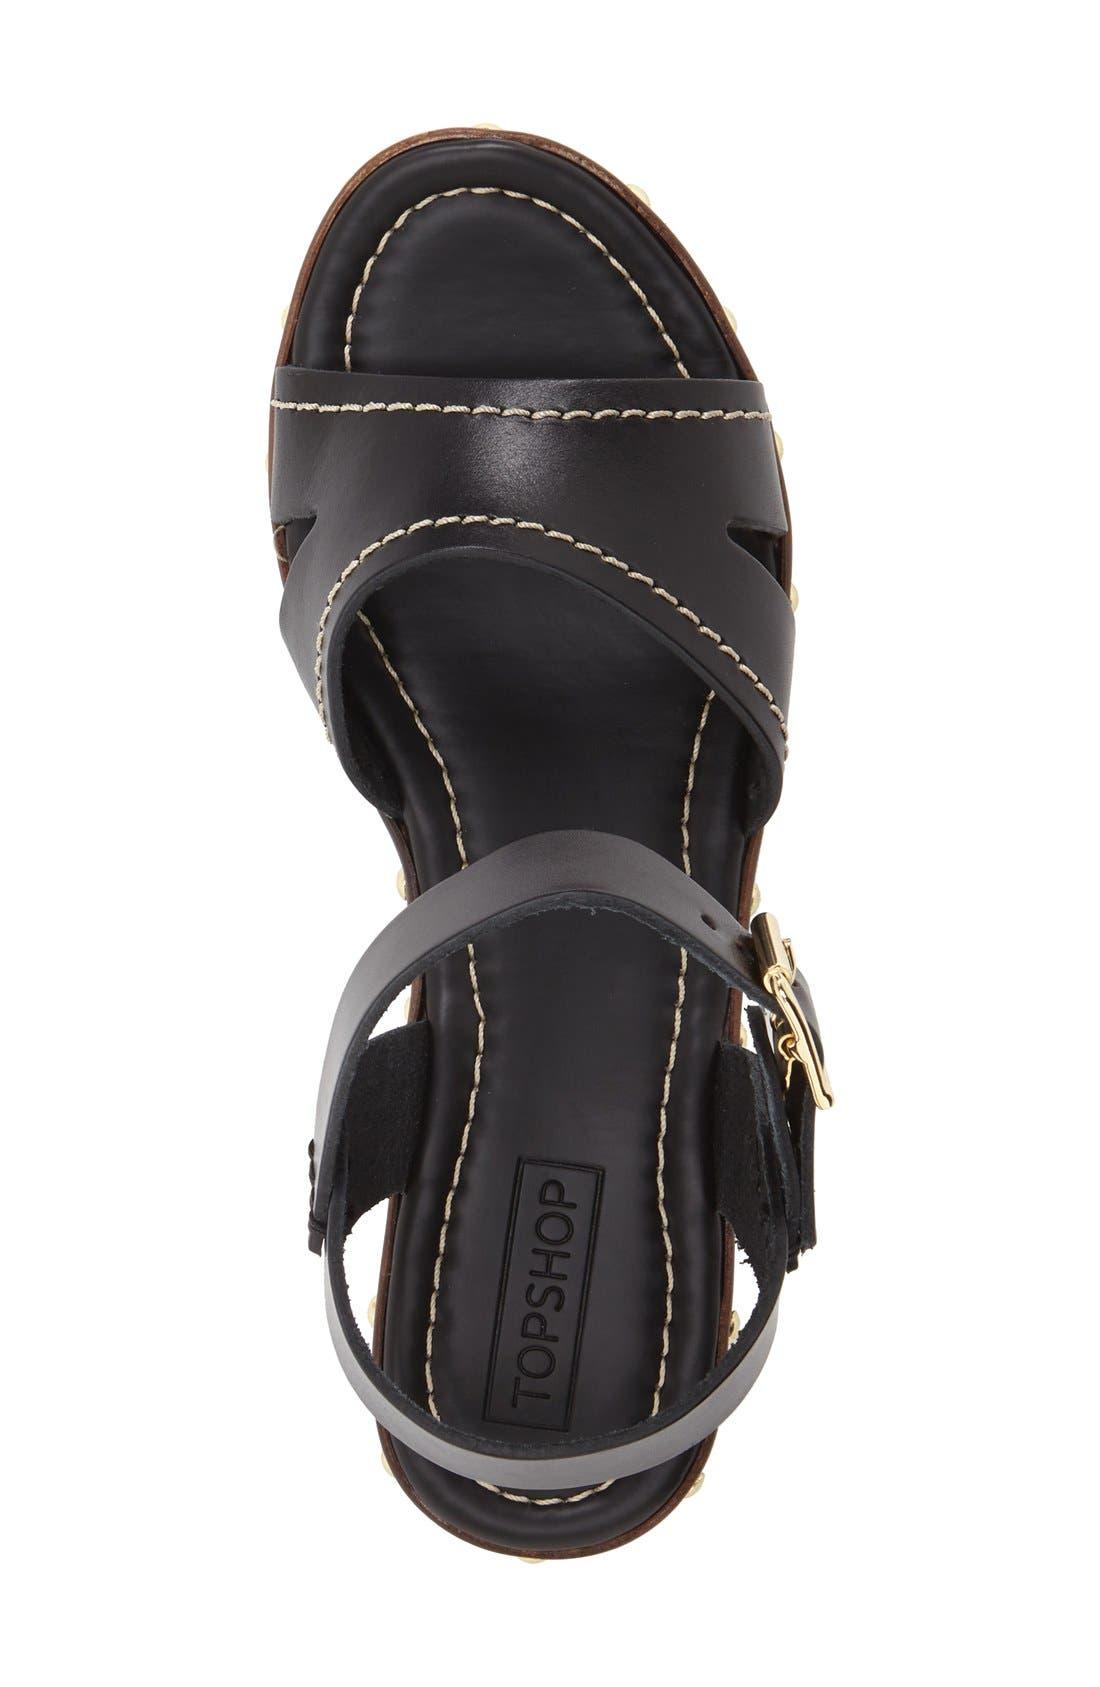 'VIV' Clog Sandals,                             Alternate thumbnail 3, color,                             Black